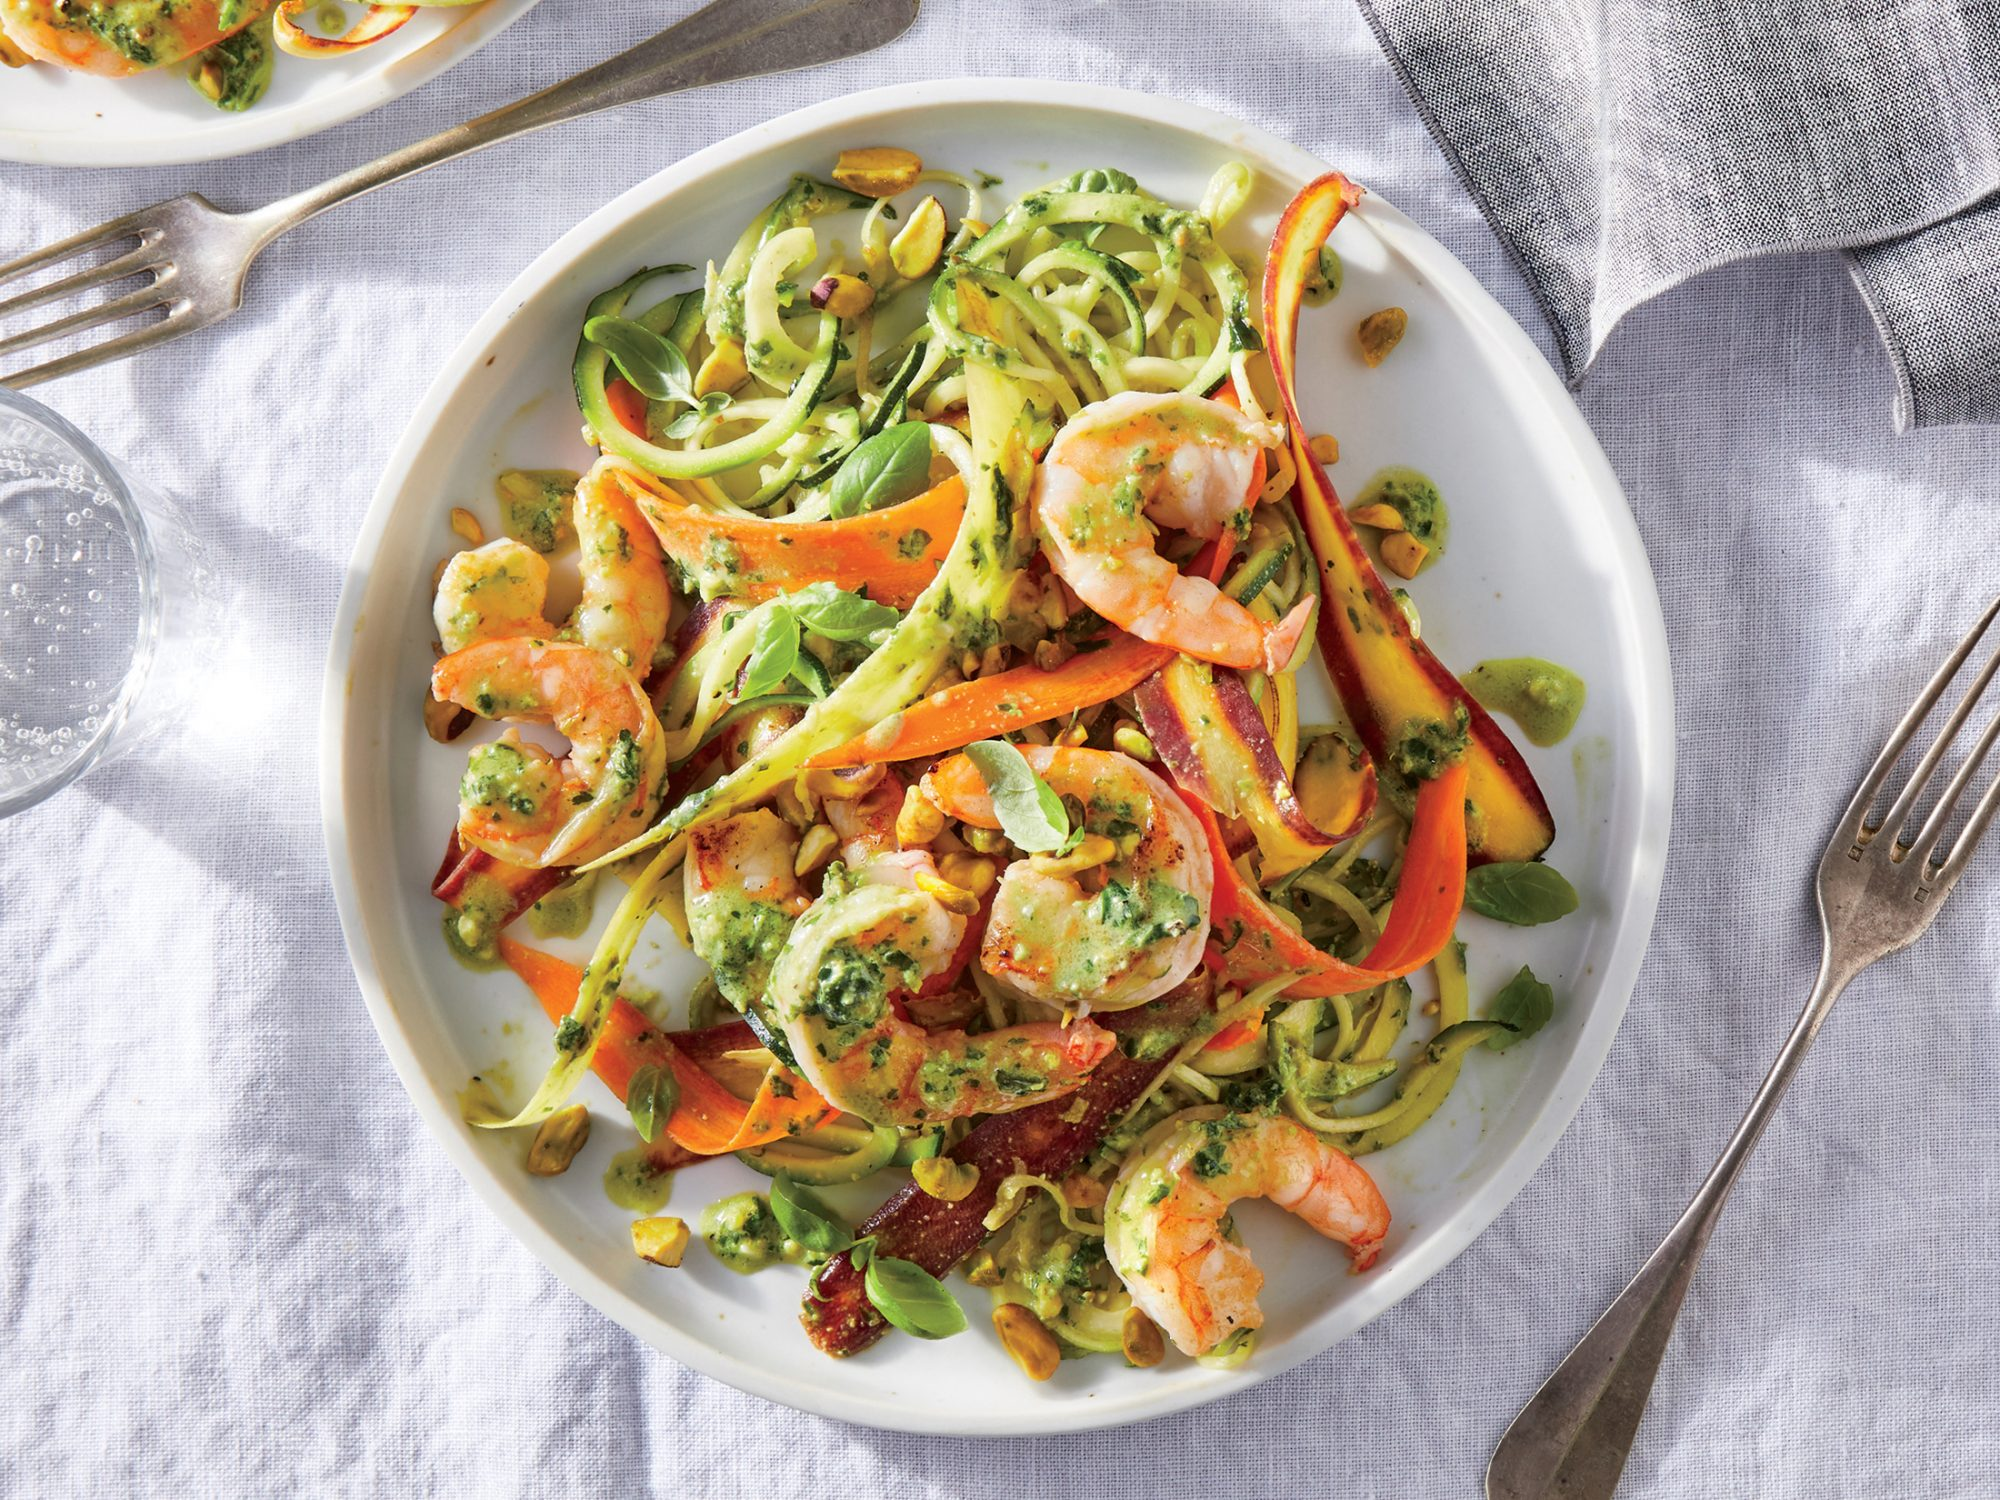 Veggie Noodles with Shrimp and Pistachio Pesto